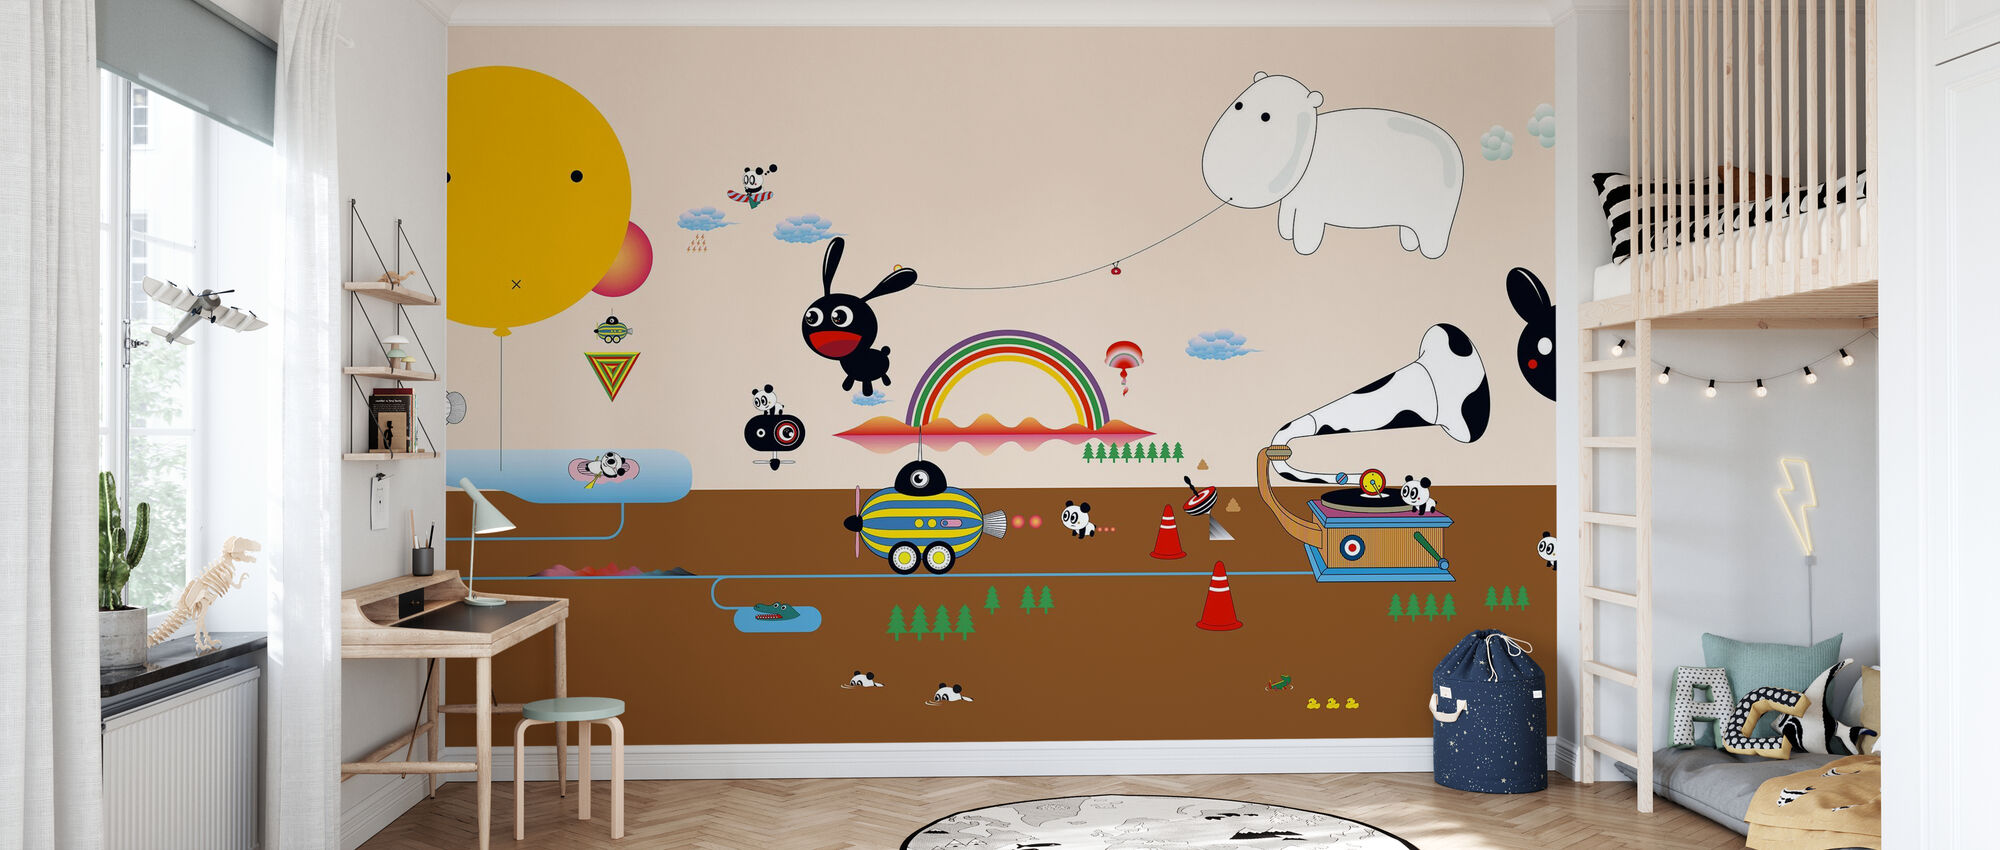 Qianqian Beachlife - Wallpaper - Kids Room